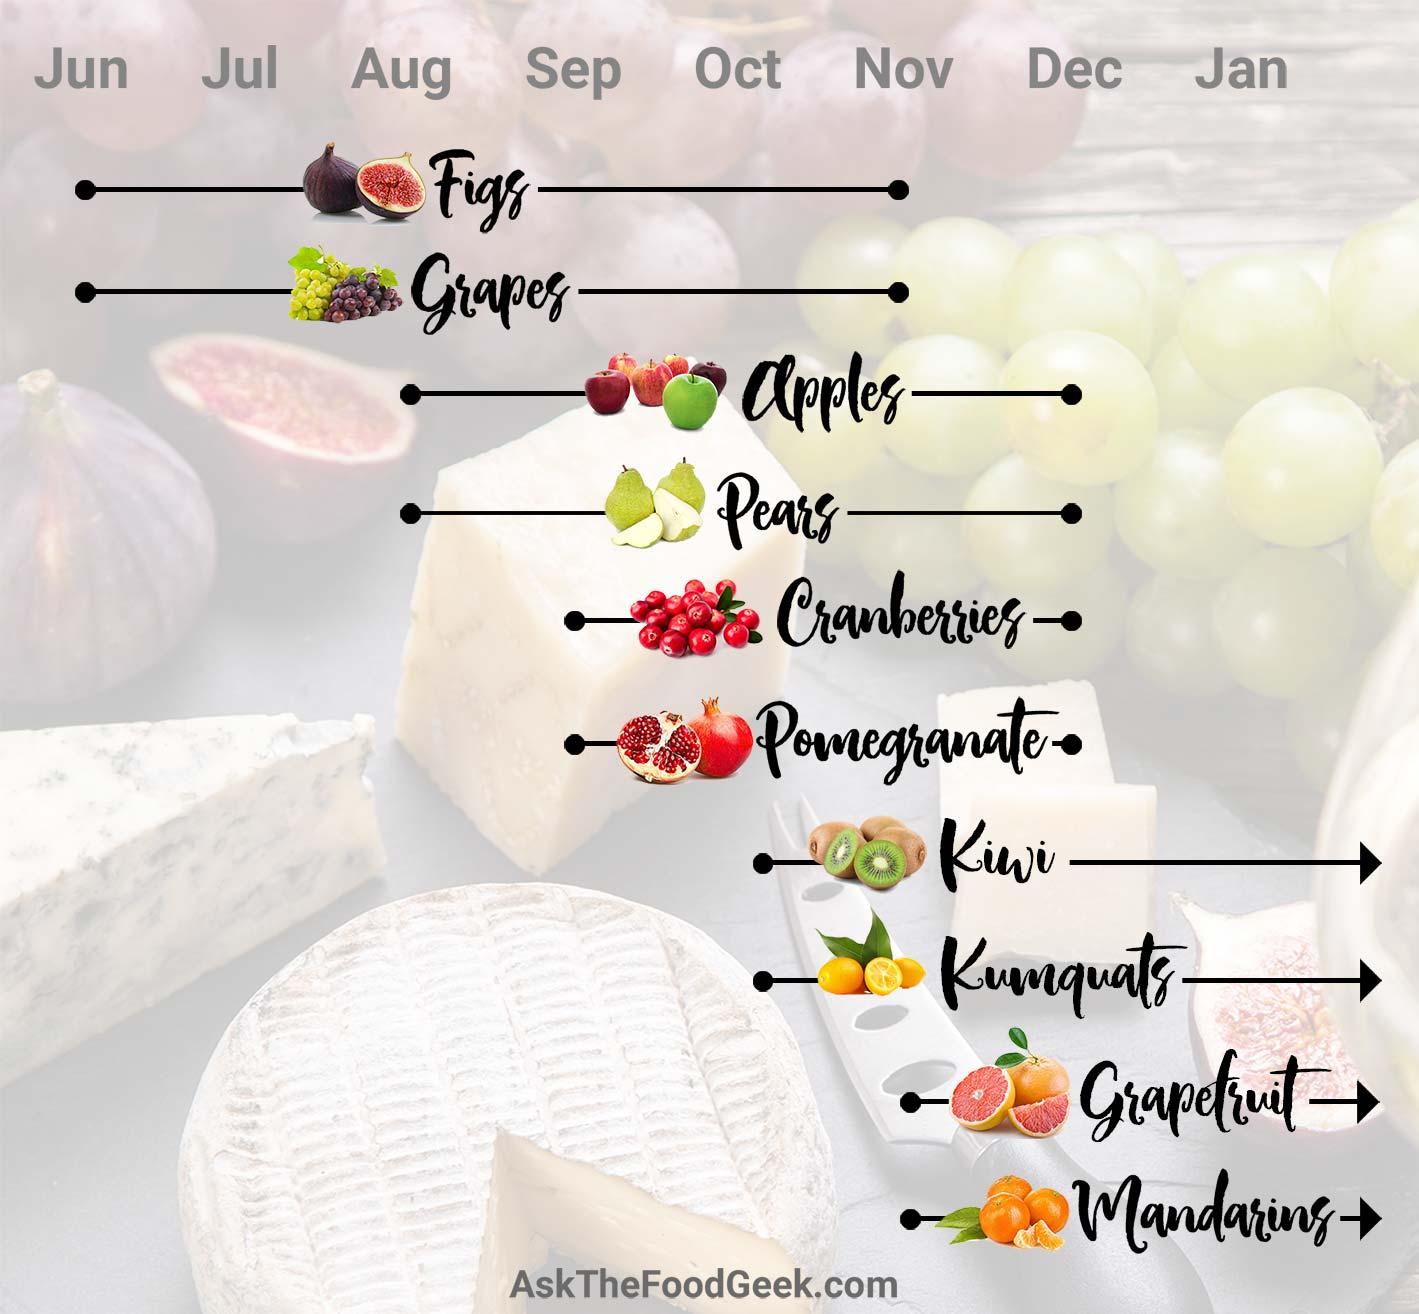 What fruit is in season in November: Figs, grapes, apples, pears, cranberries, pomegranate, kiwi, kumquats, grapefruit, and mandarins